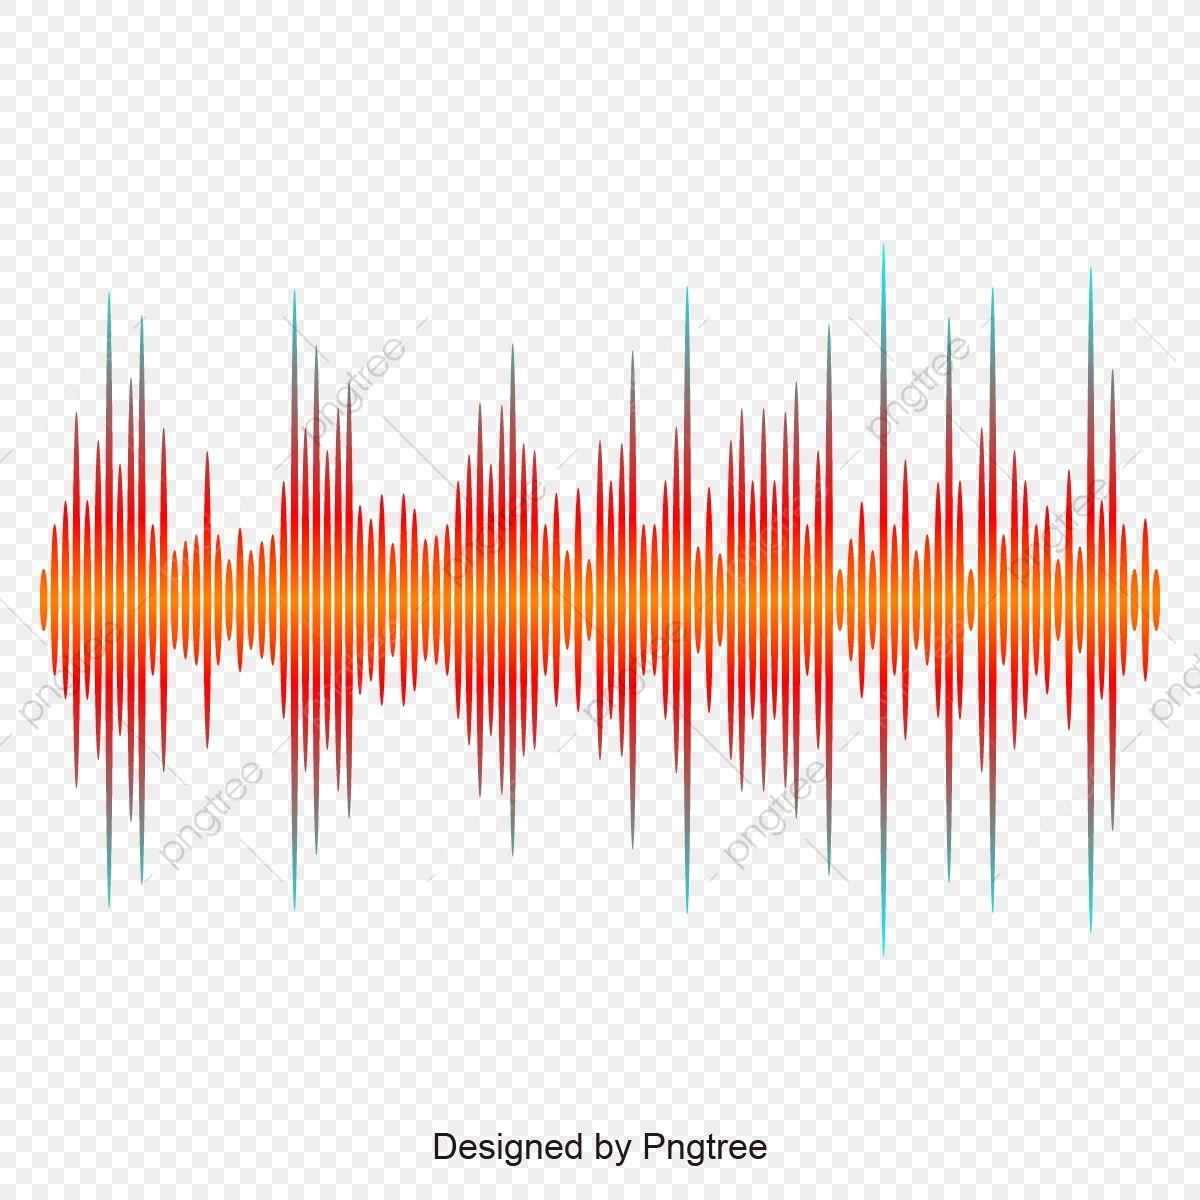 Orange Sound Wave Design Sound Wave Design Sound Wave Wave Png And Vector With Transparent Background For Free Download Sound Waves Design Sound Waves Wave Design